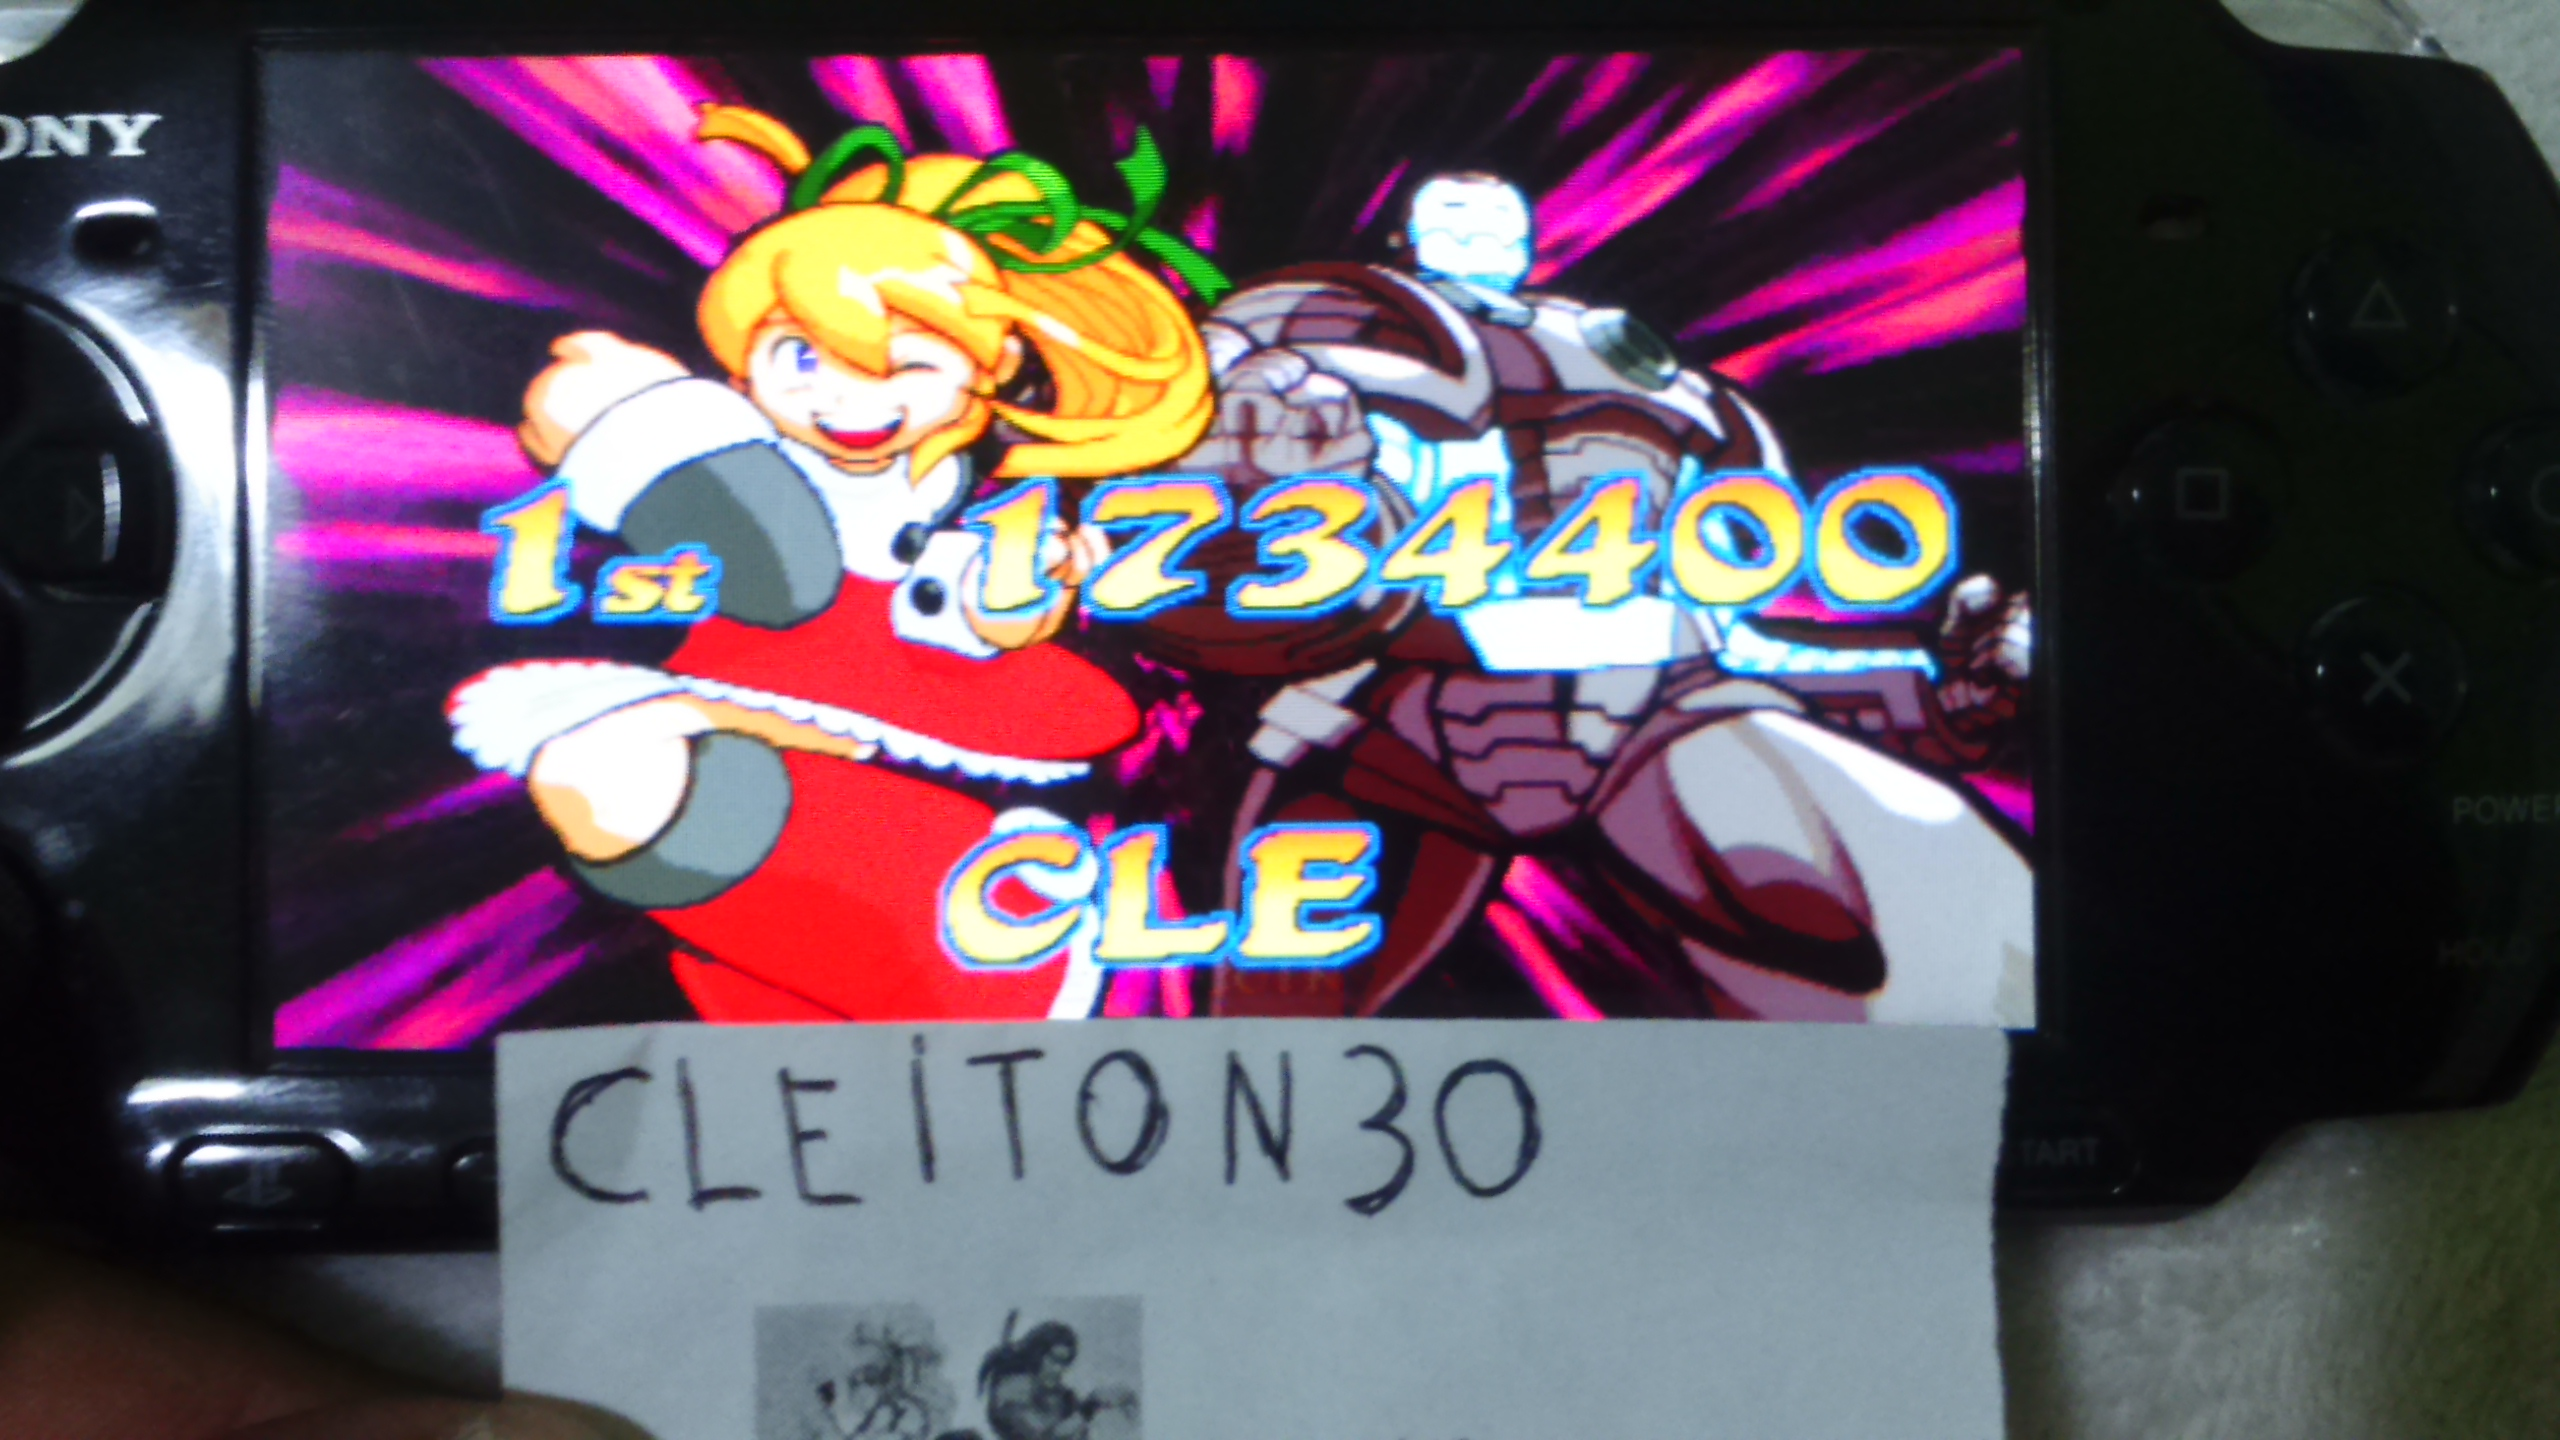 Cleiton30: Marvel vs. Capcom: Clash of Super Heroes (Arcade Emulated / M.A.M.E.) 1,734,400 points on 2016-05-21 19:09:35